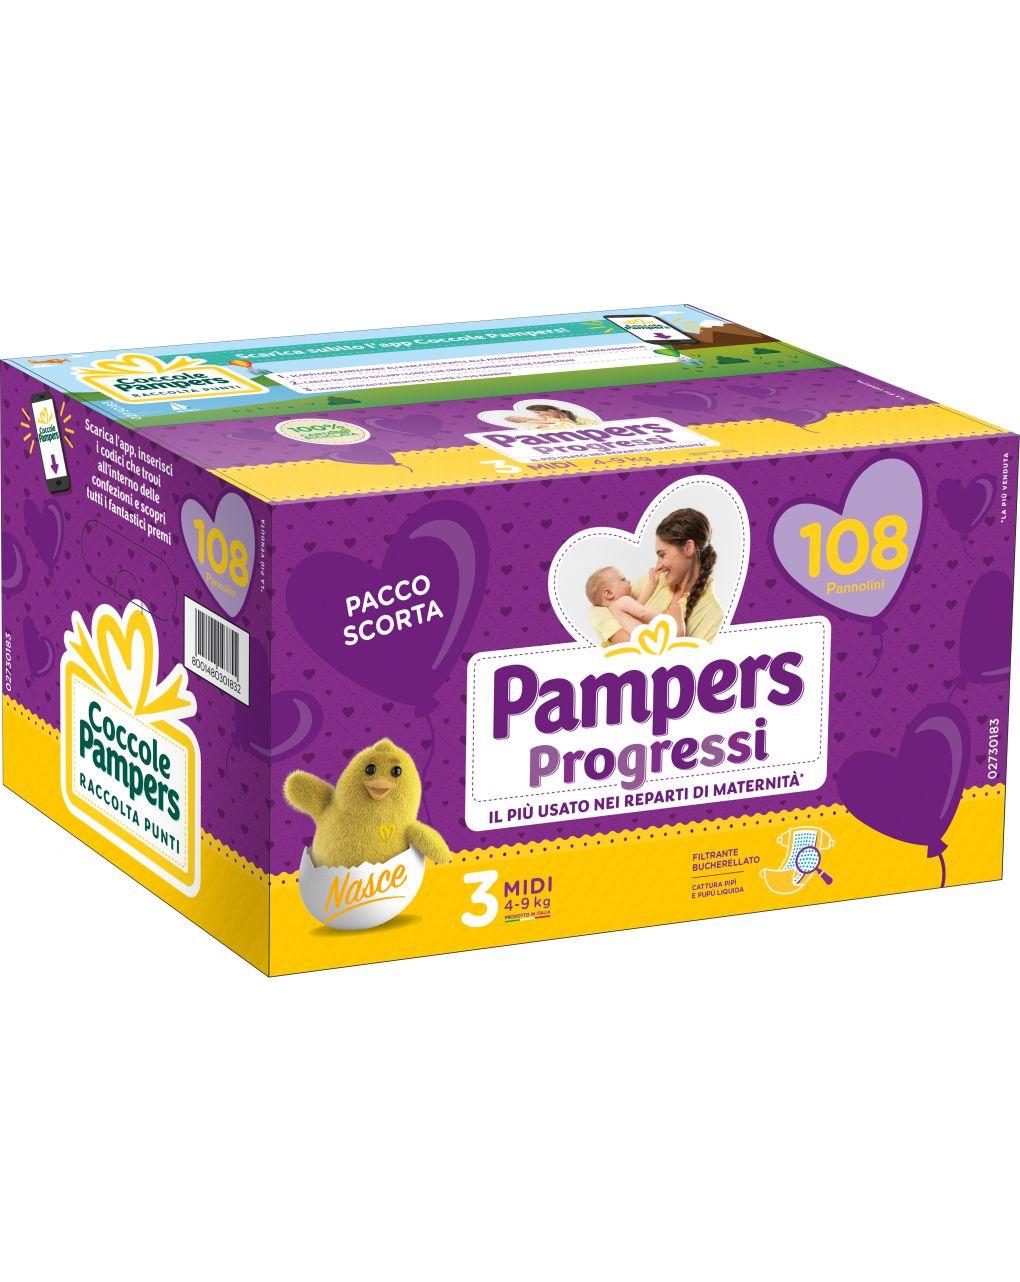 Pannolini quadri progressi tg. 3 (108 pz) - Pampers